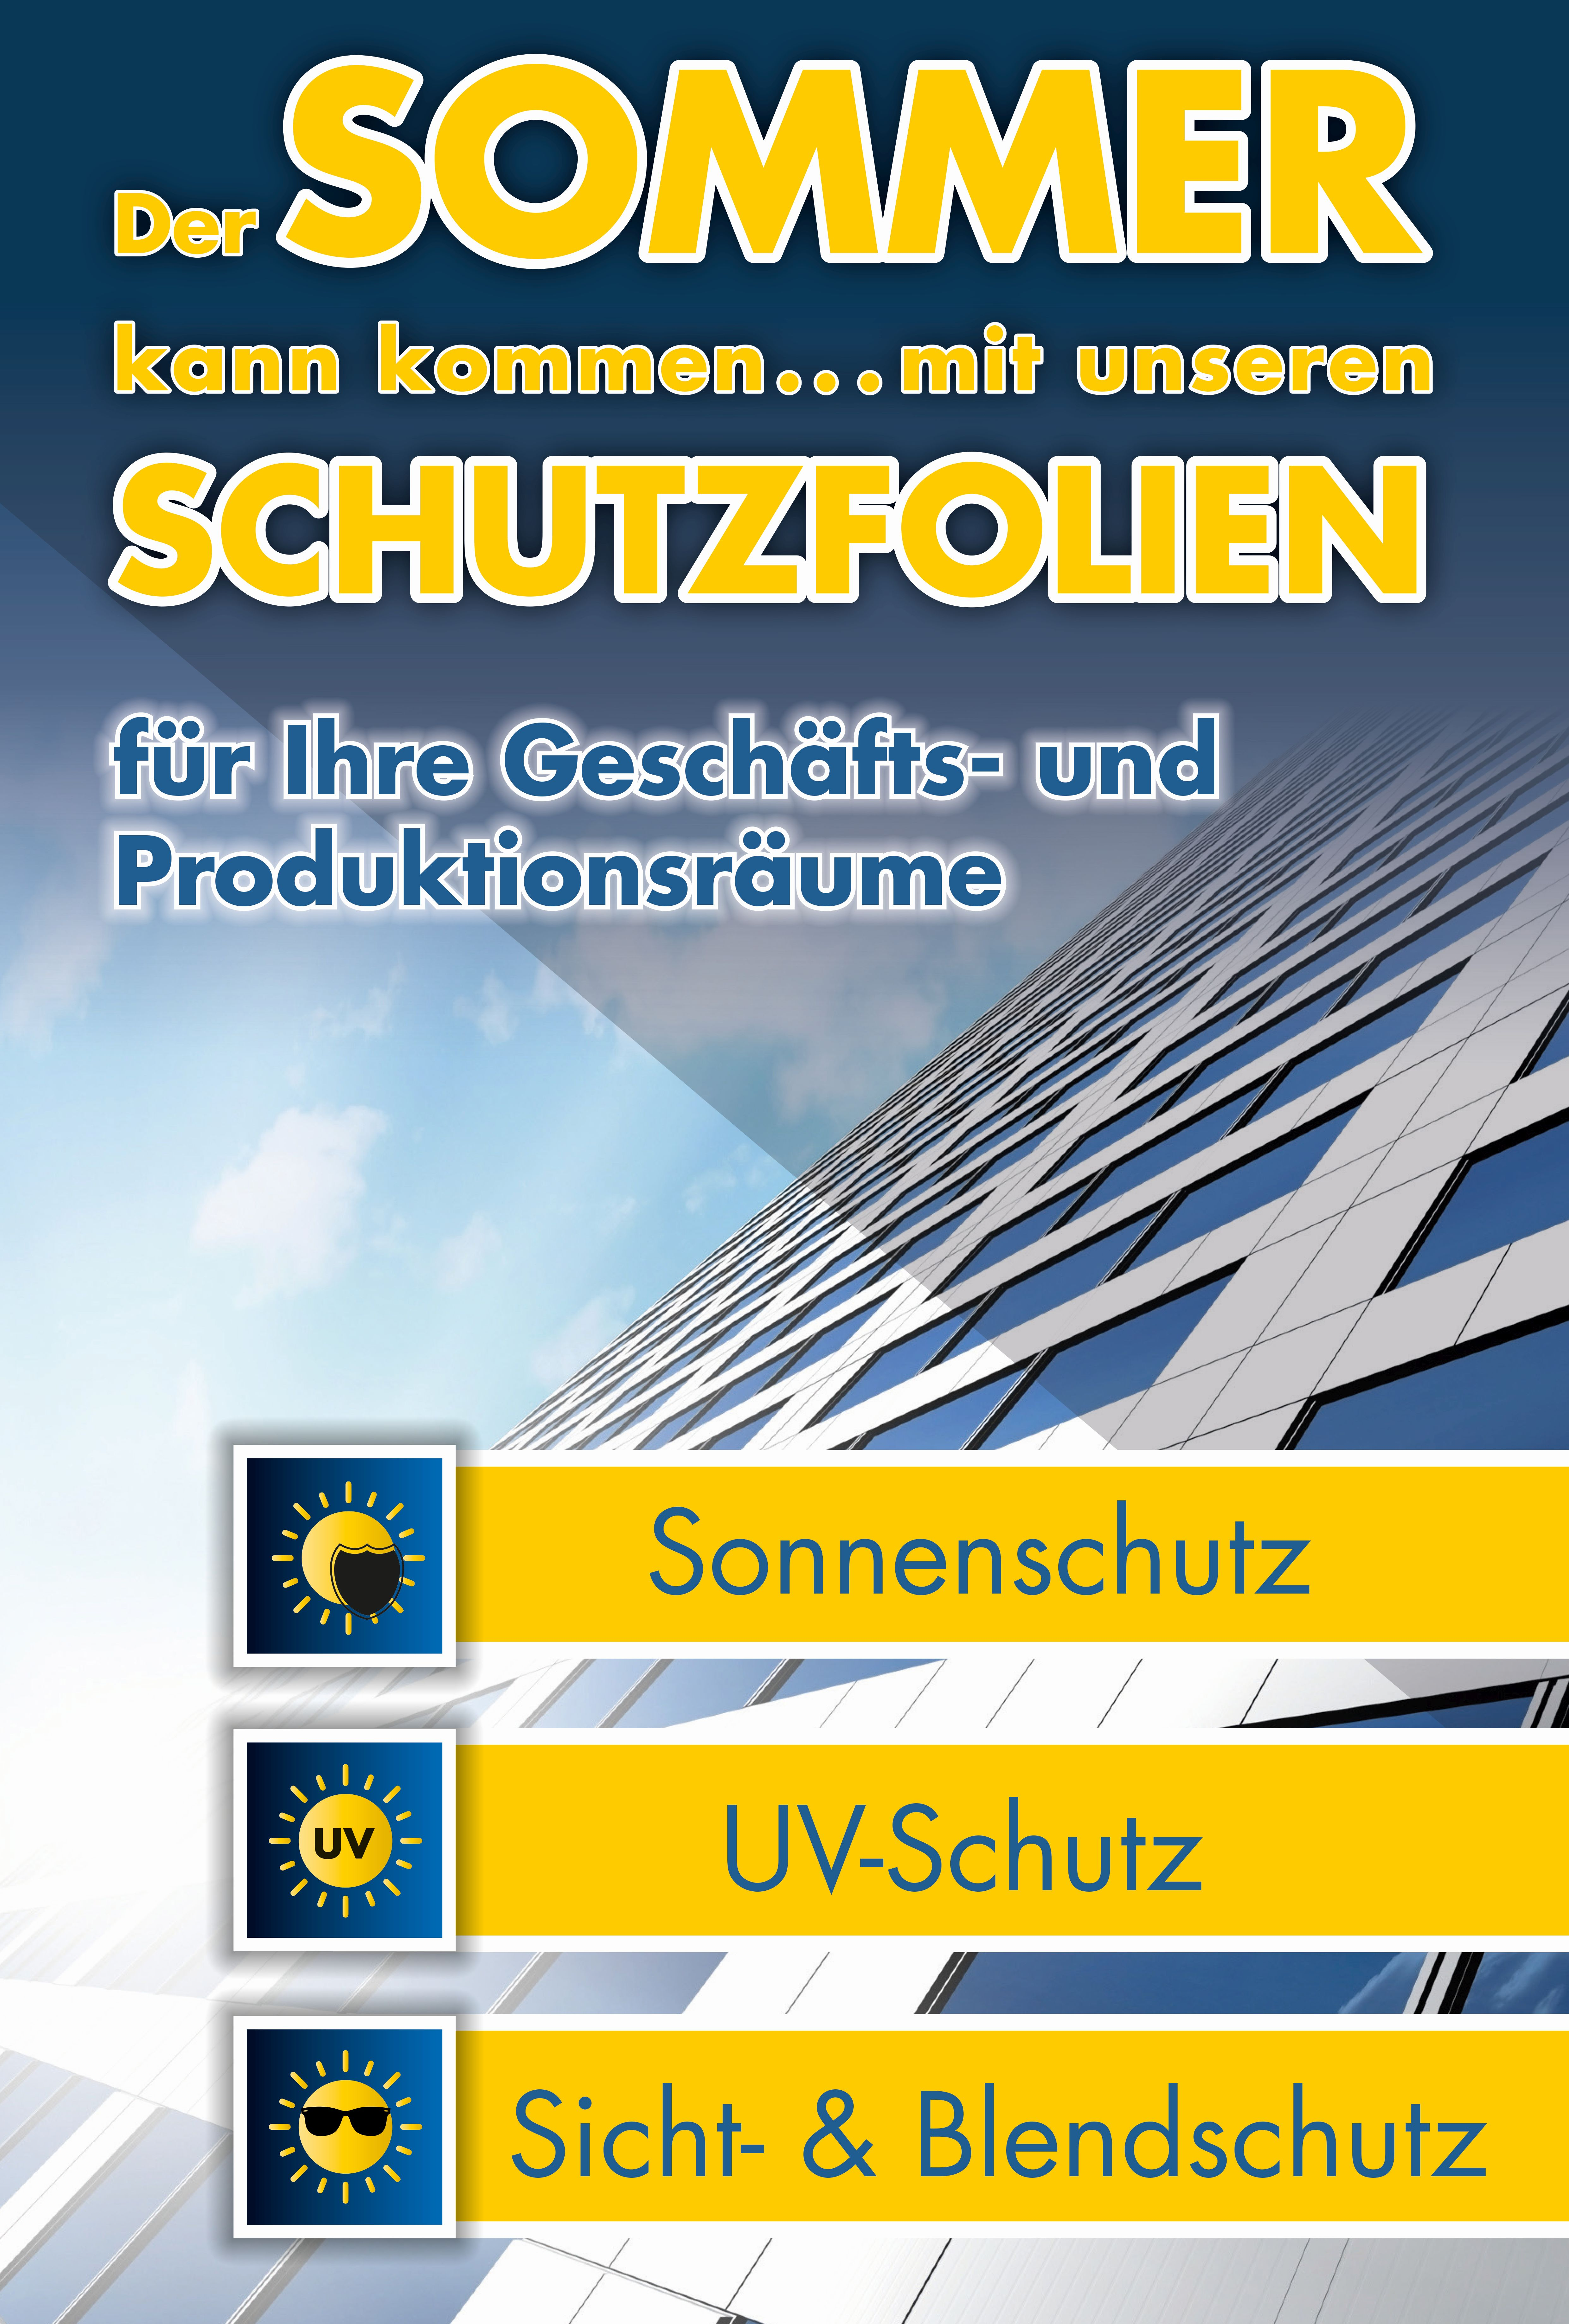 Rollup_Schutzfolien_April2018.indd